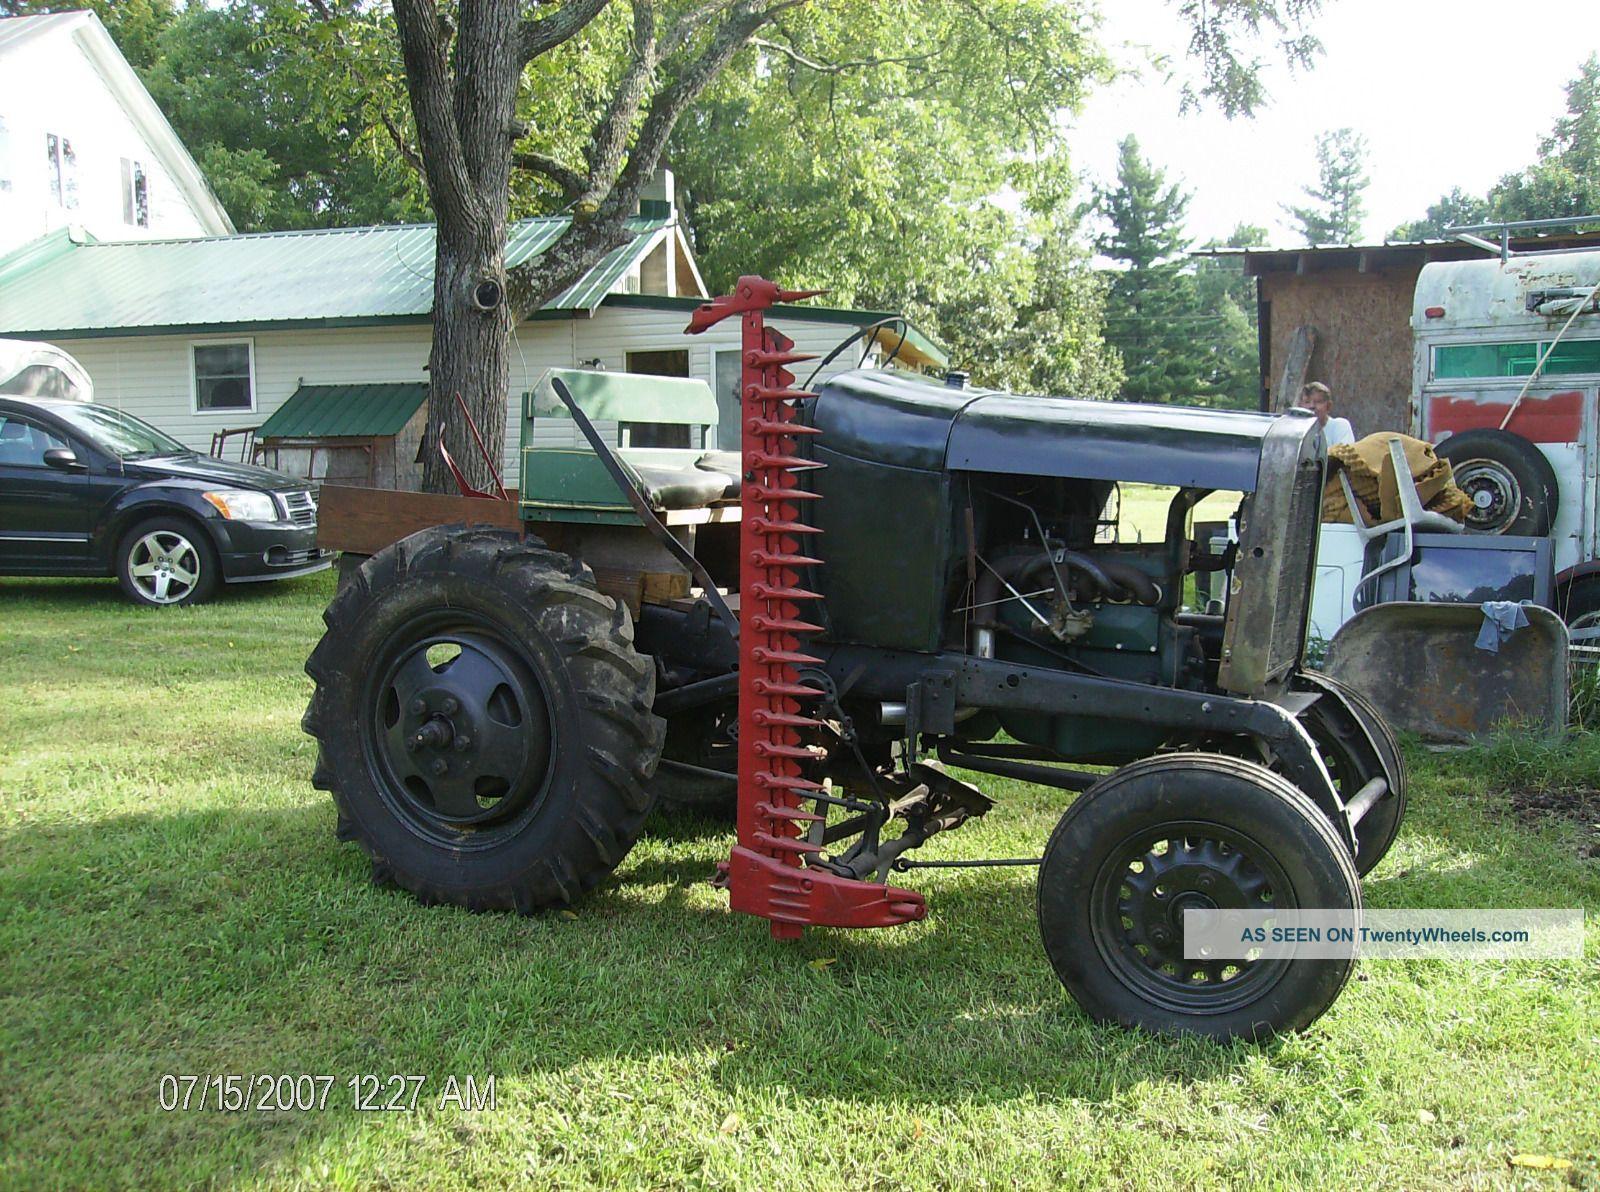 Doodlebug Tractor Craigslist - a-k-b info